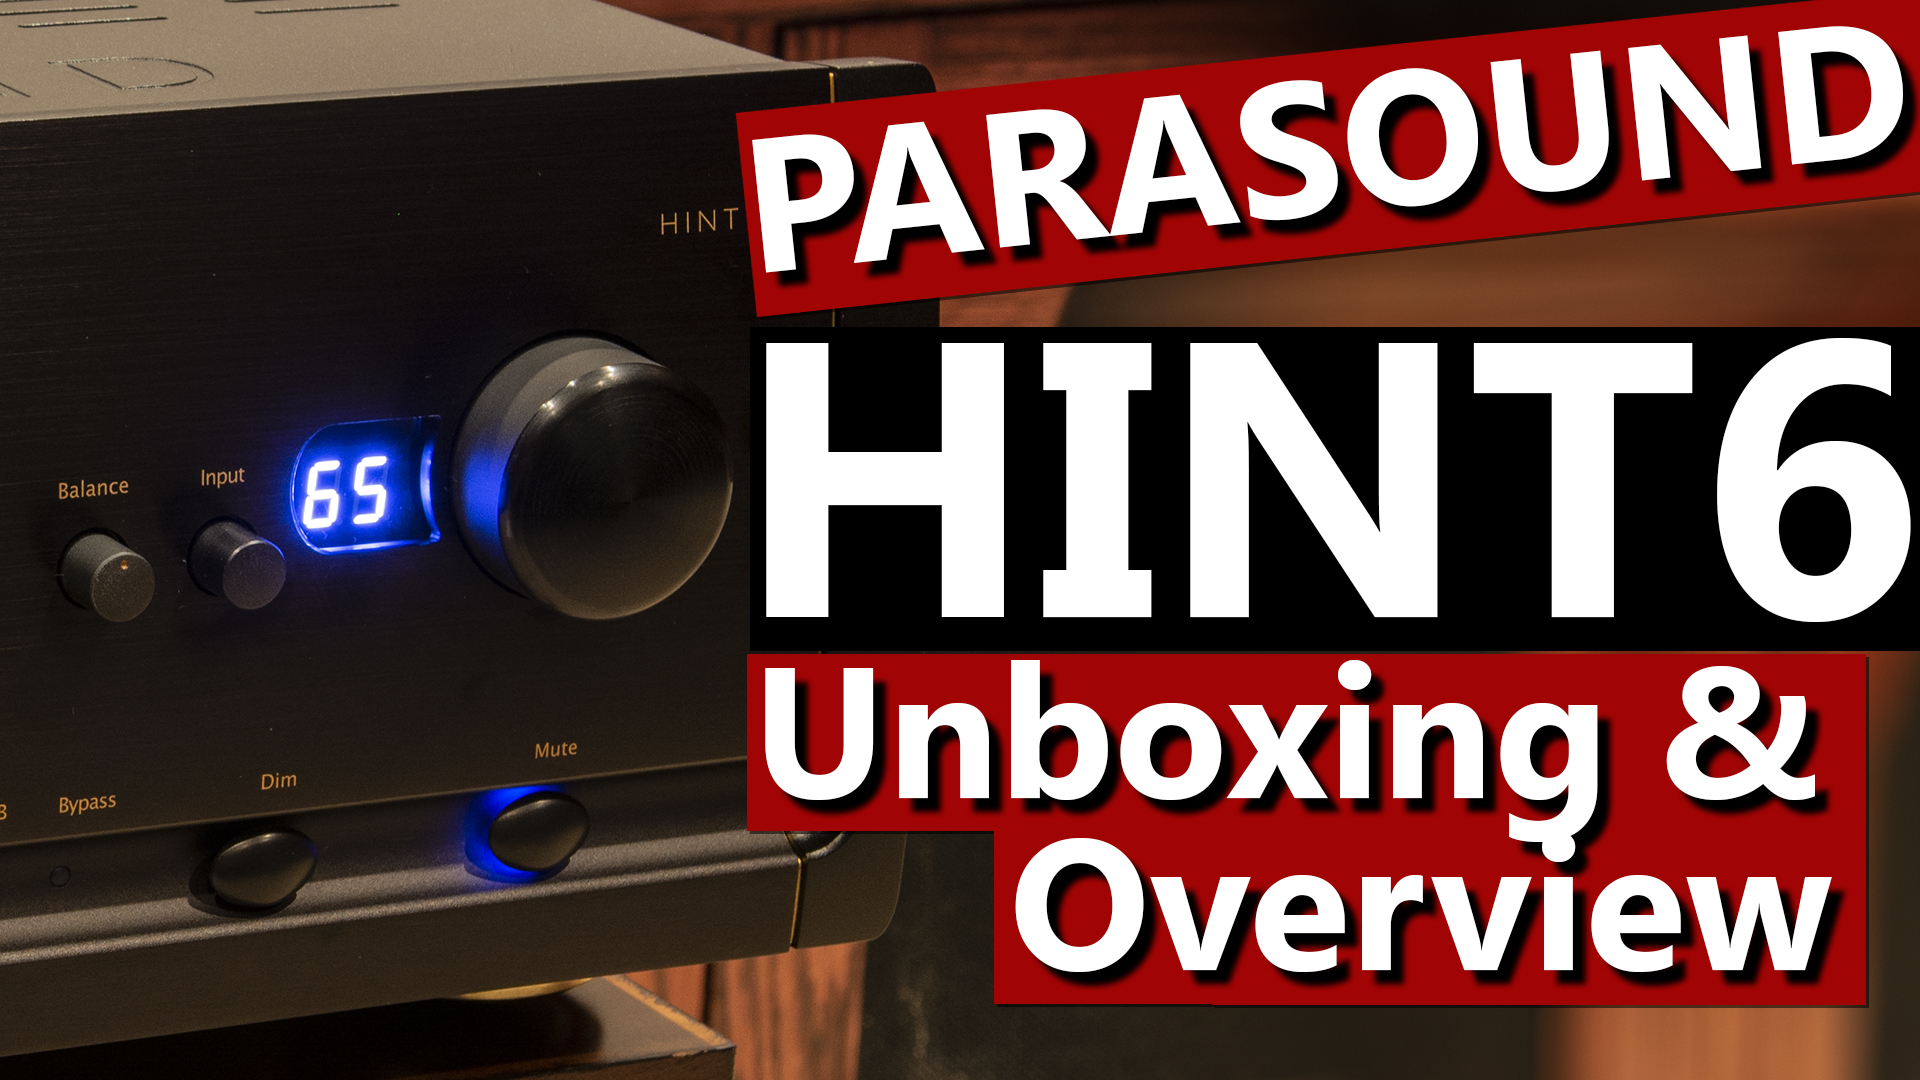 Parasound HINT6 Halo Integrated Amplifier Thumbnail